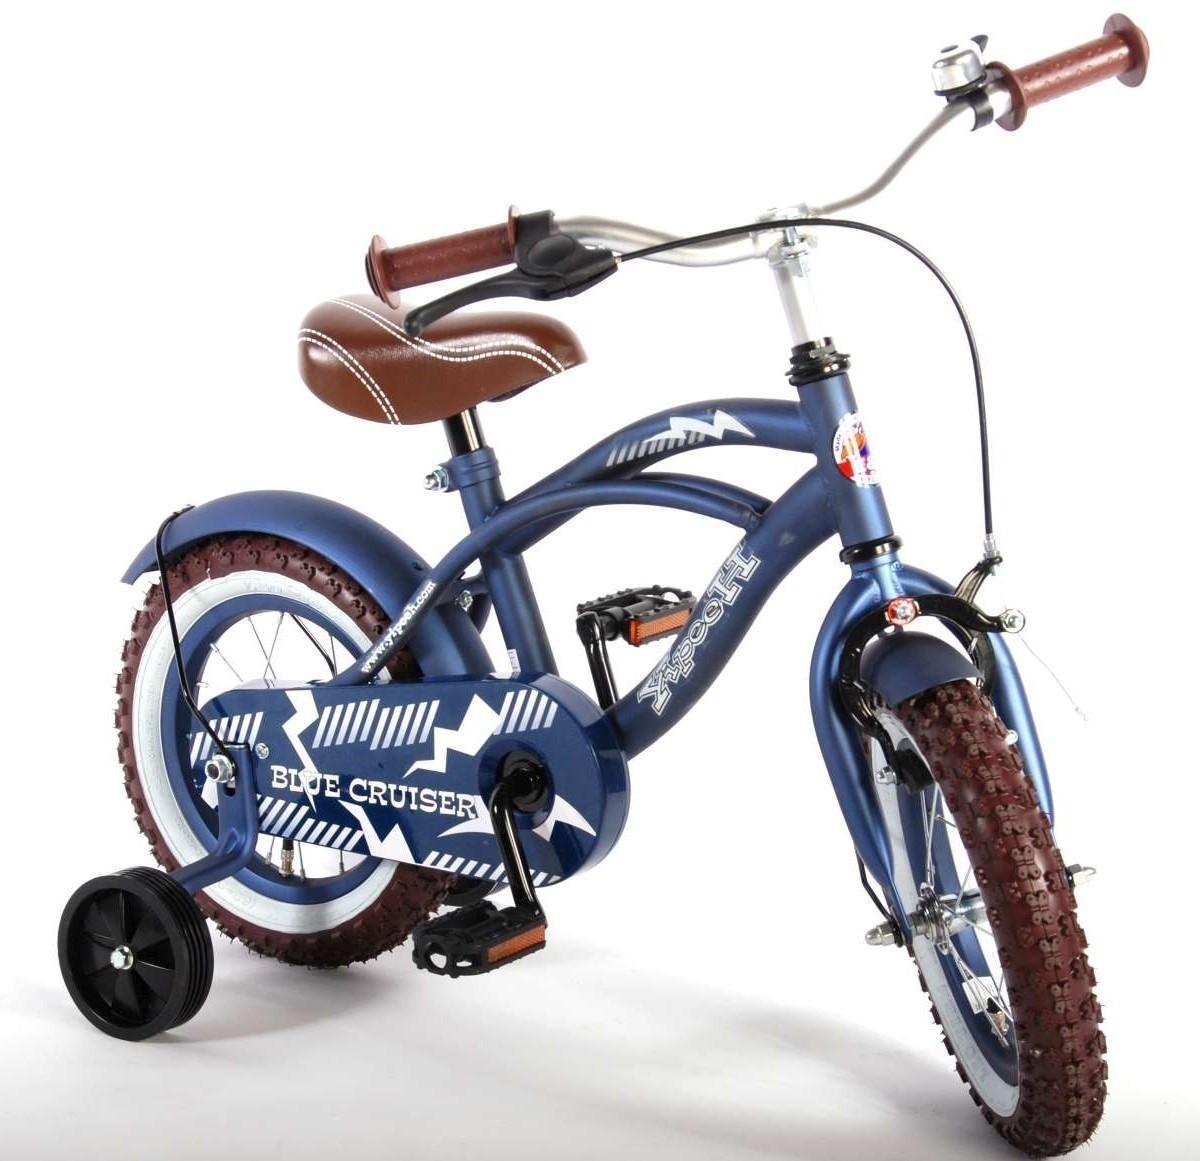 Yipeeh Blue Cruiser 12 inch jongensfiets 51201